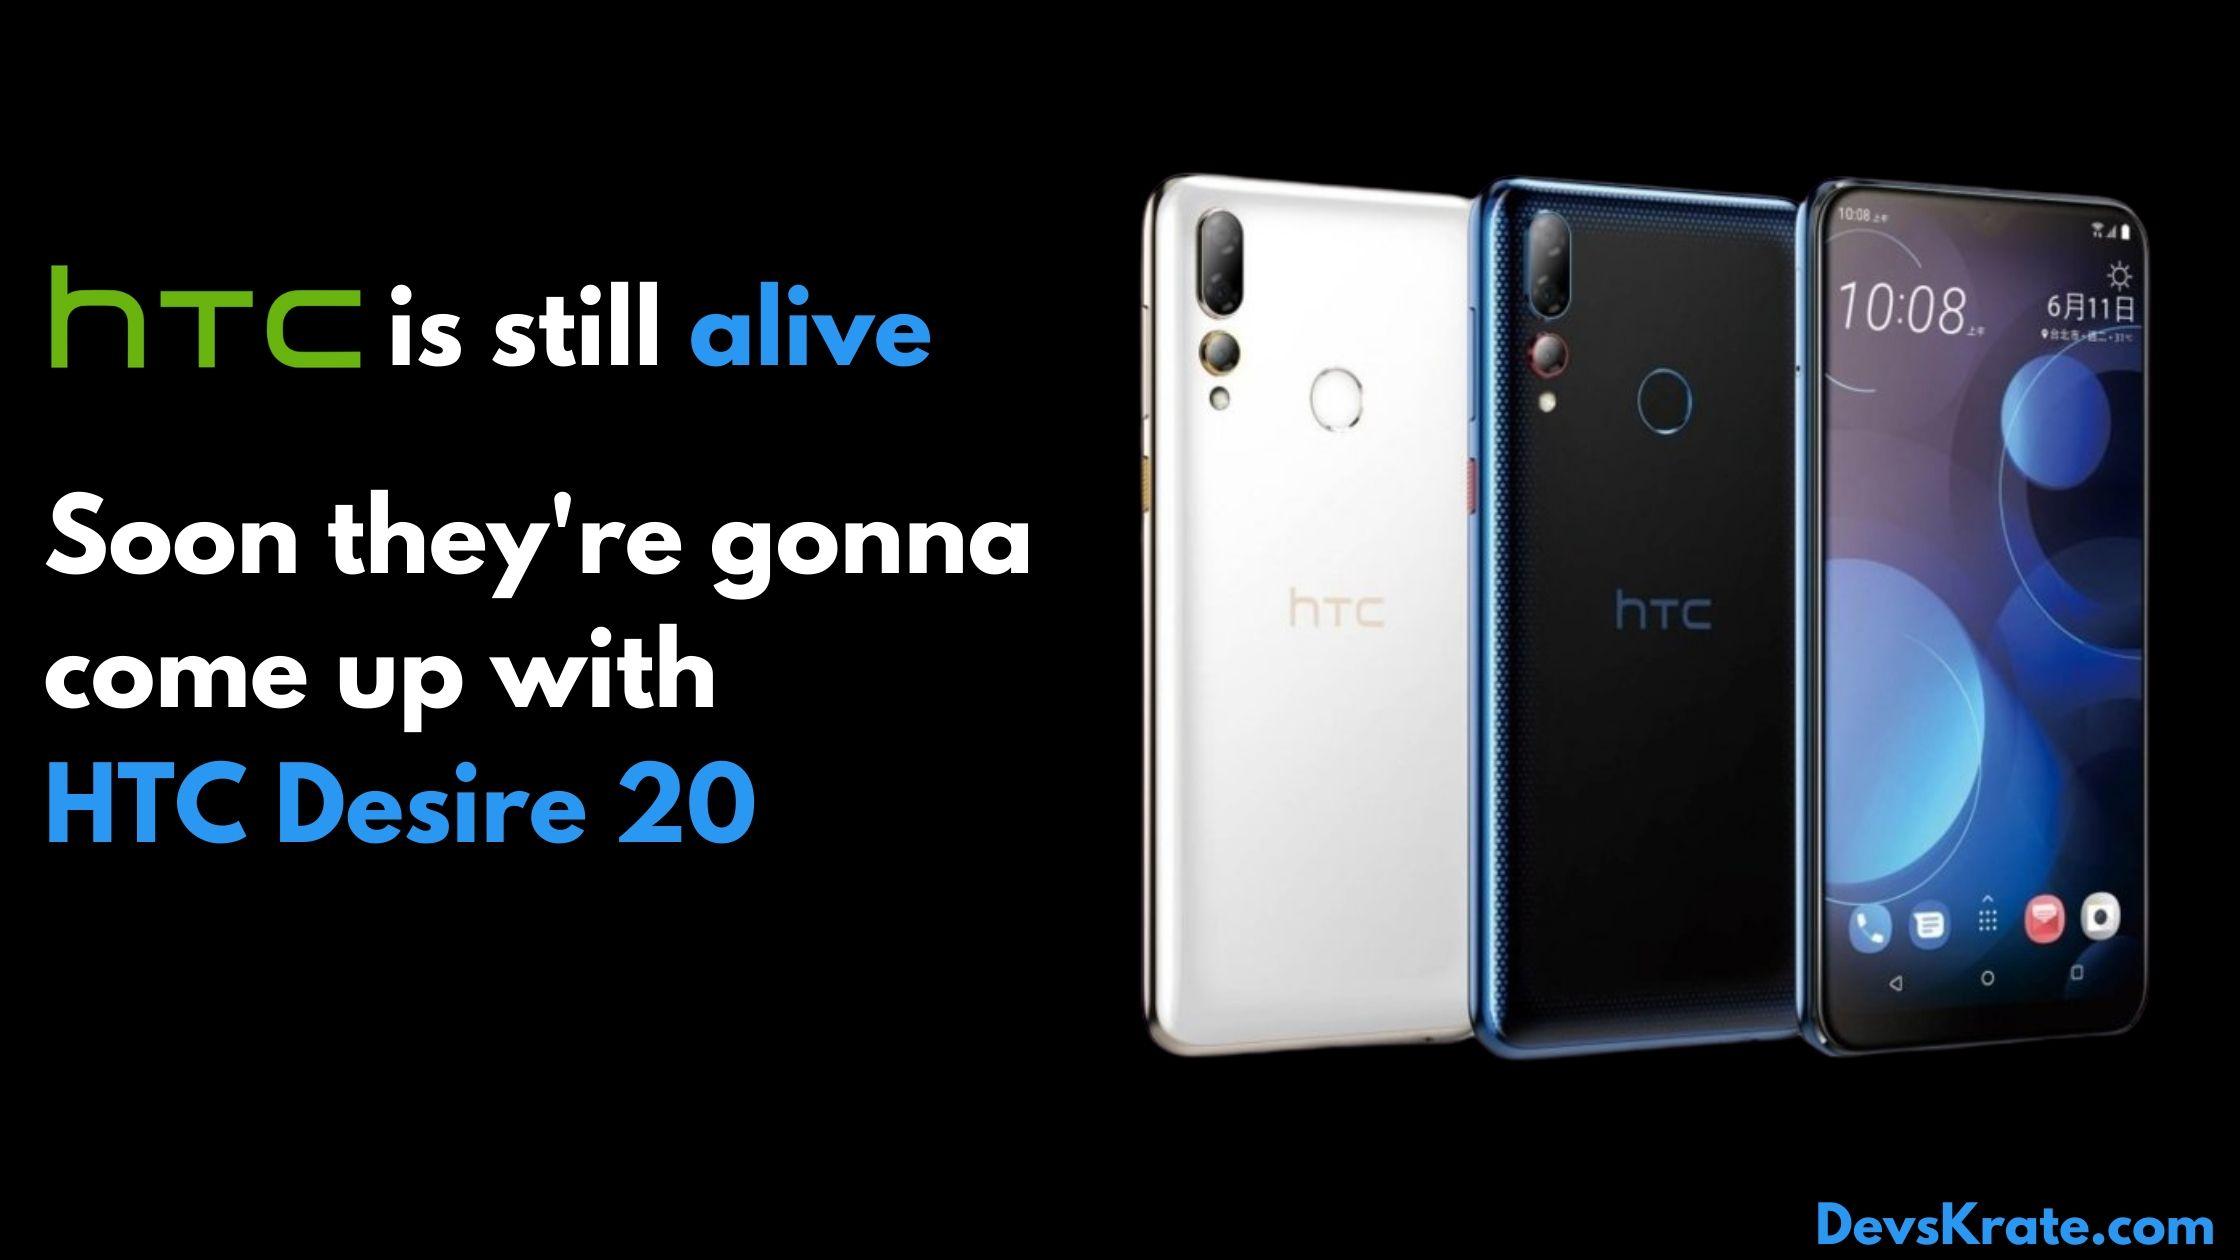 HTC Desire 20 launch date